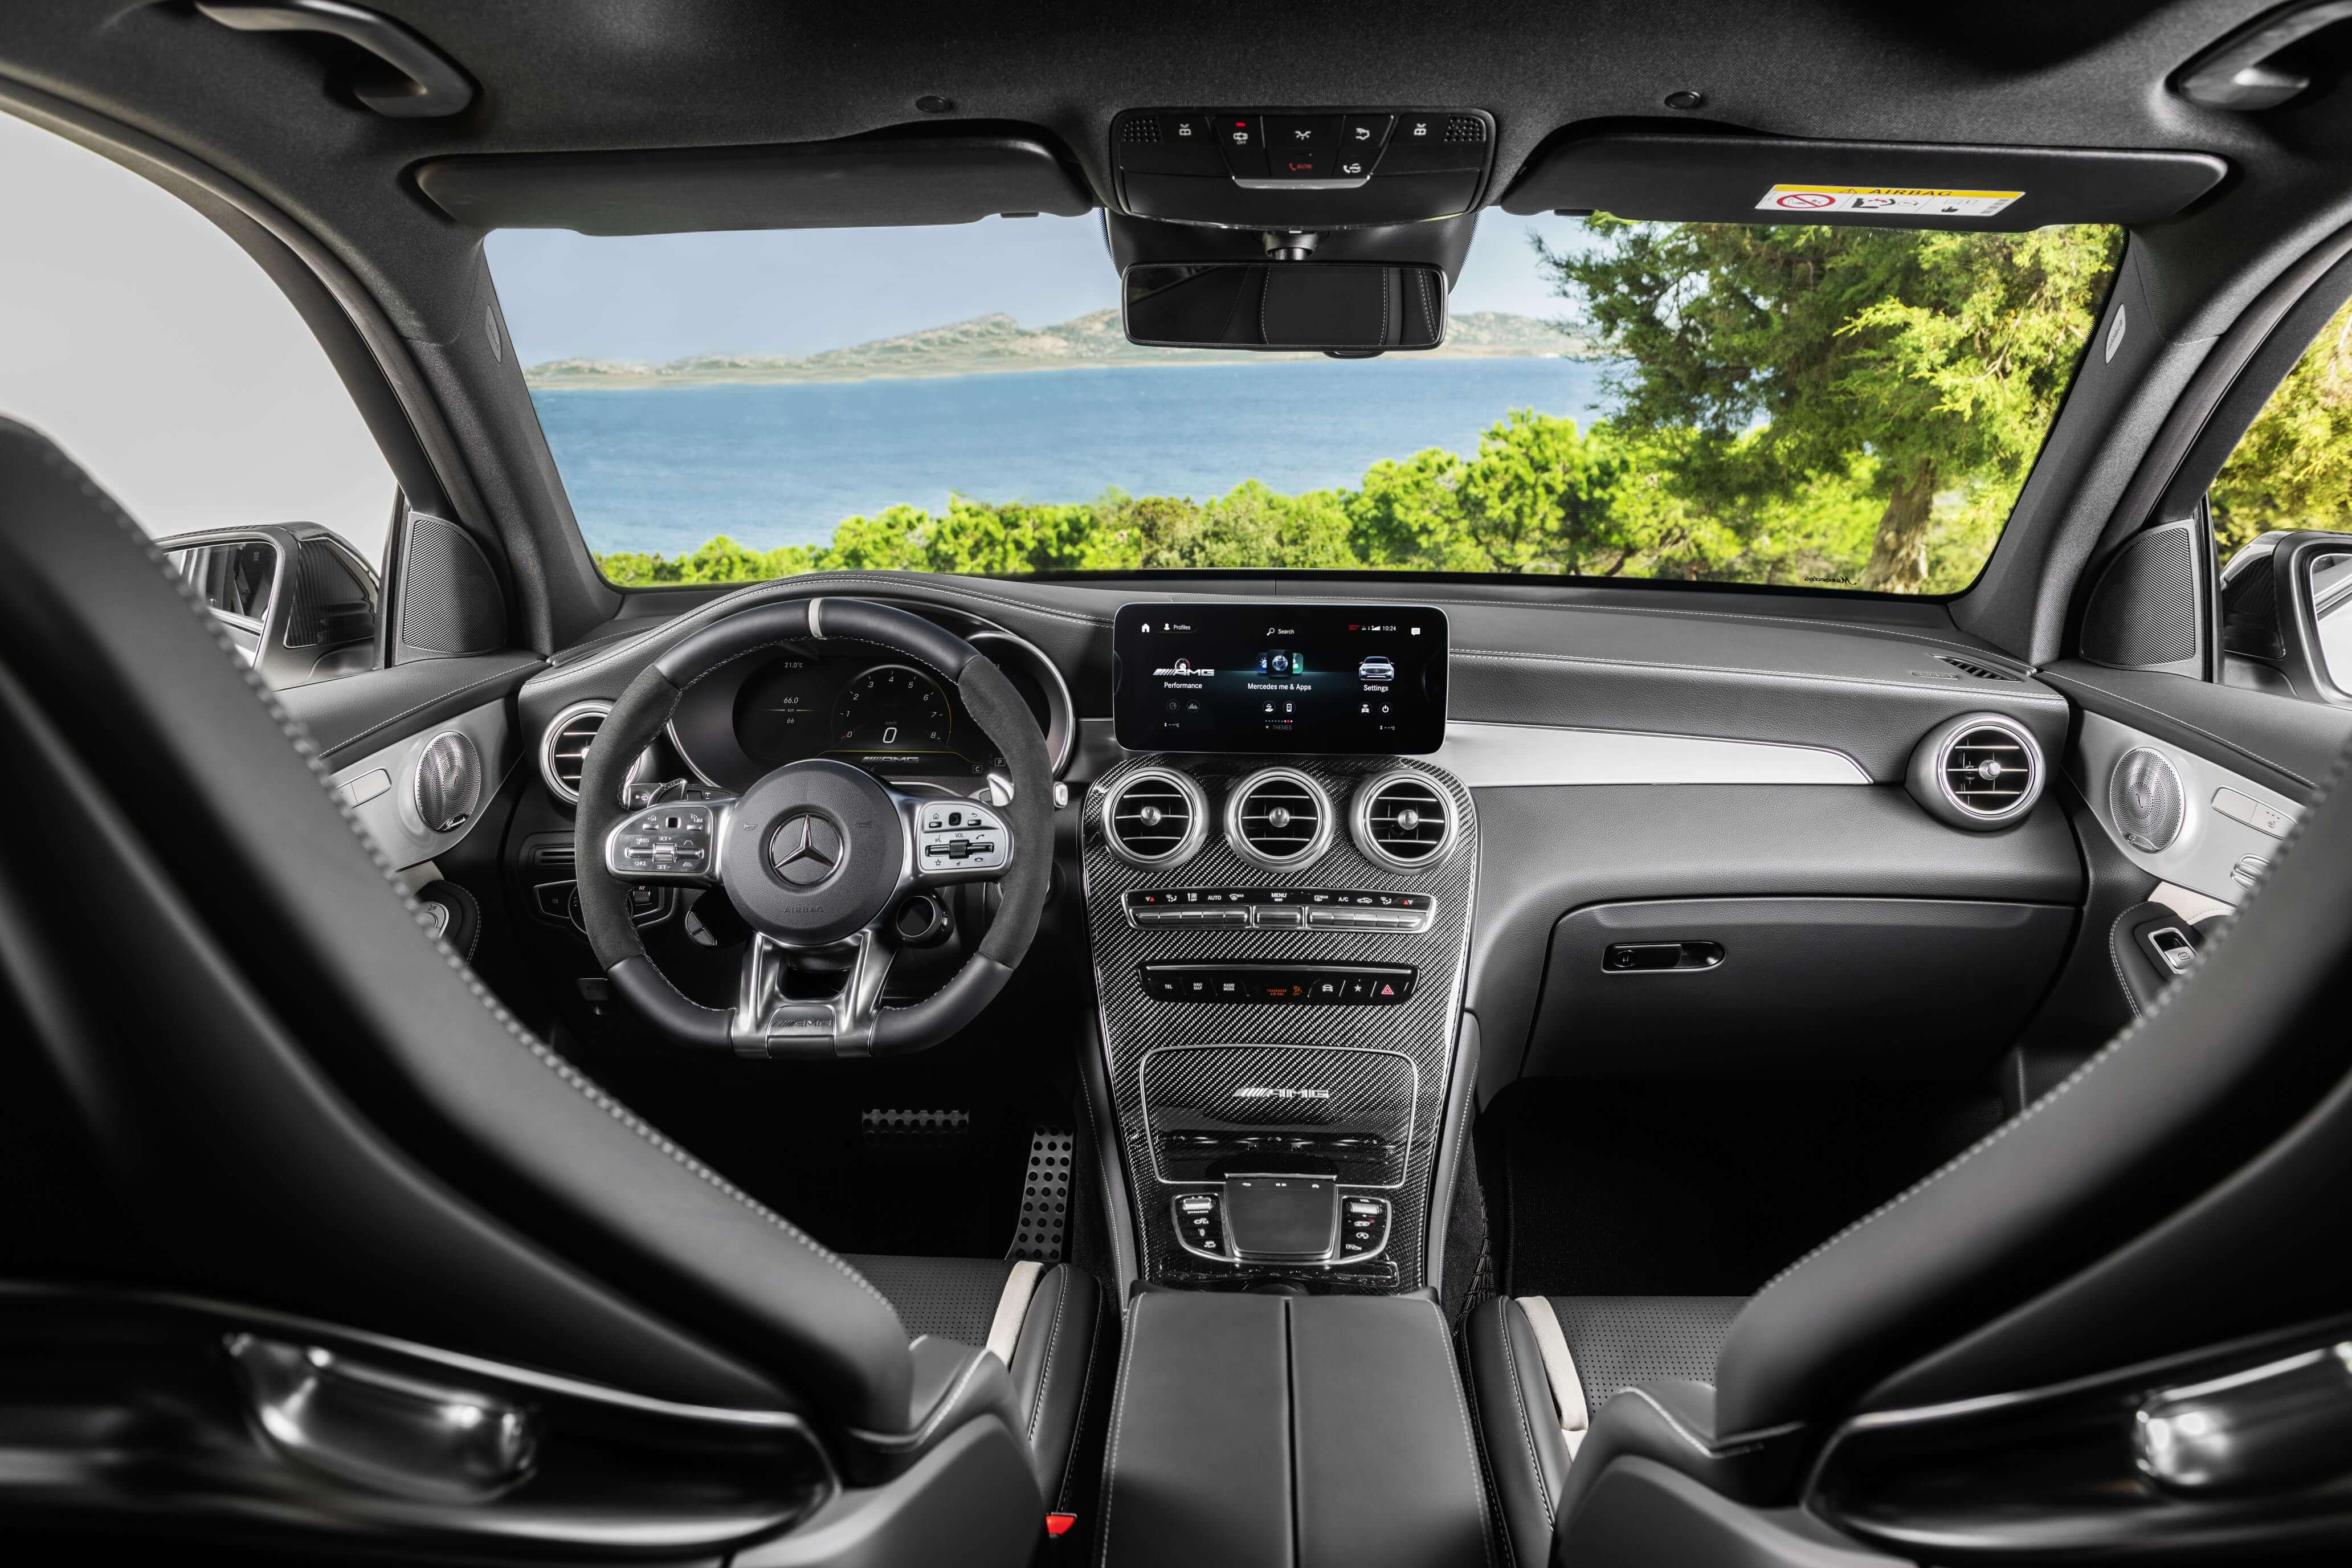 Mercedes-AMG GLC 63 S: interior